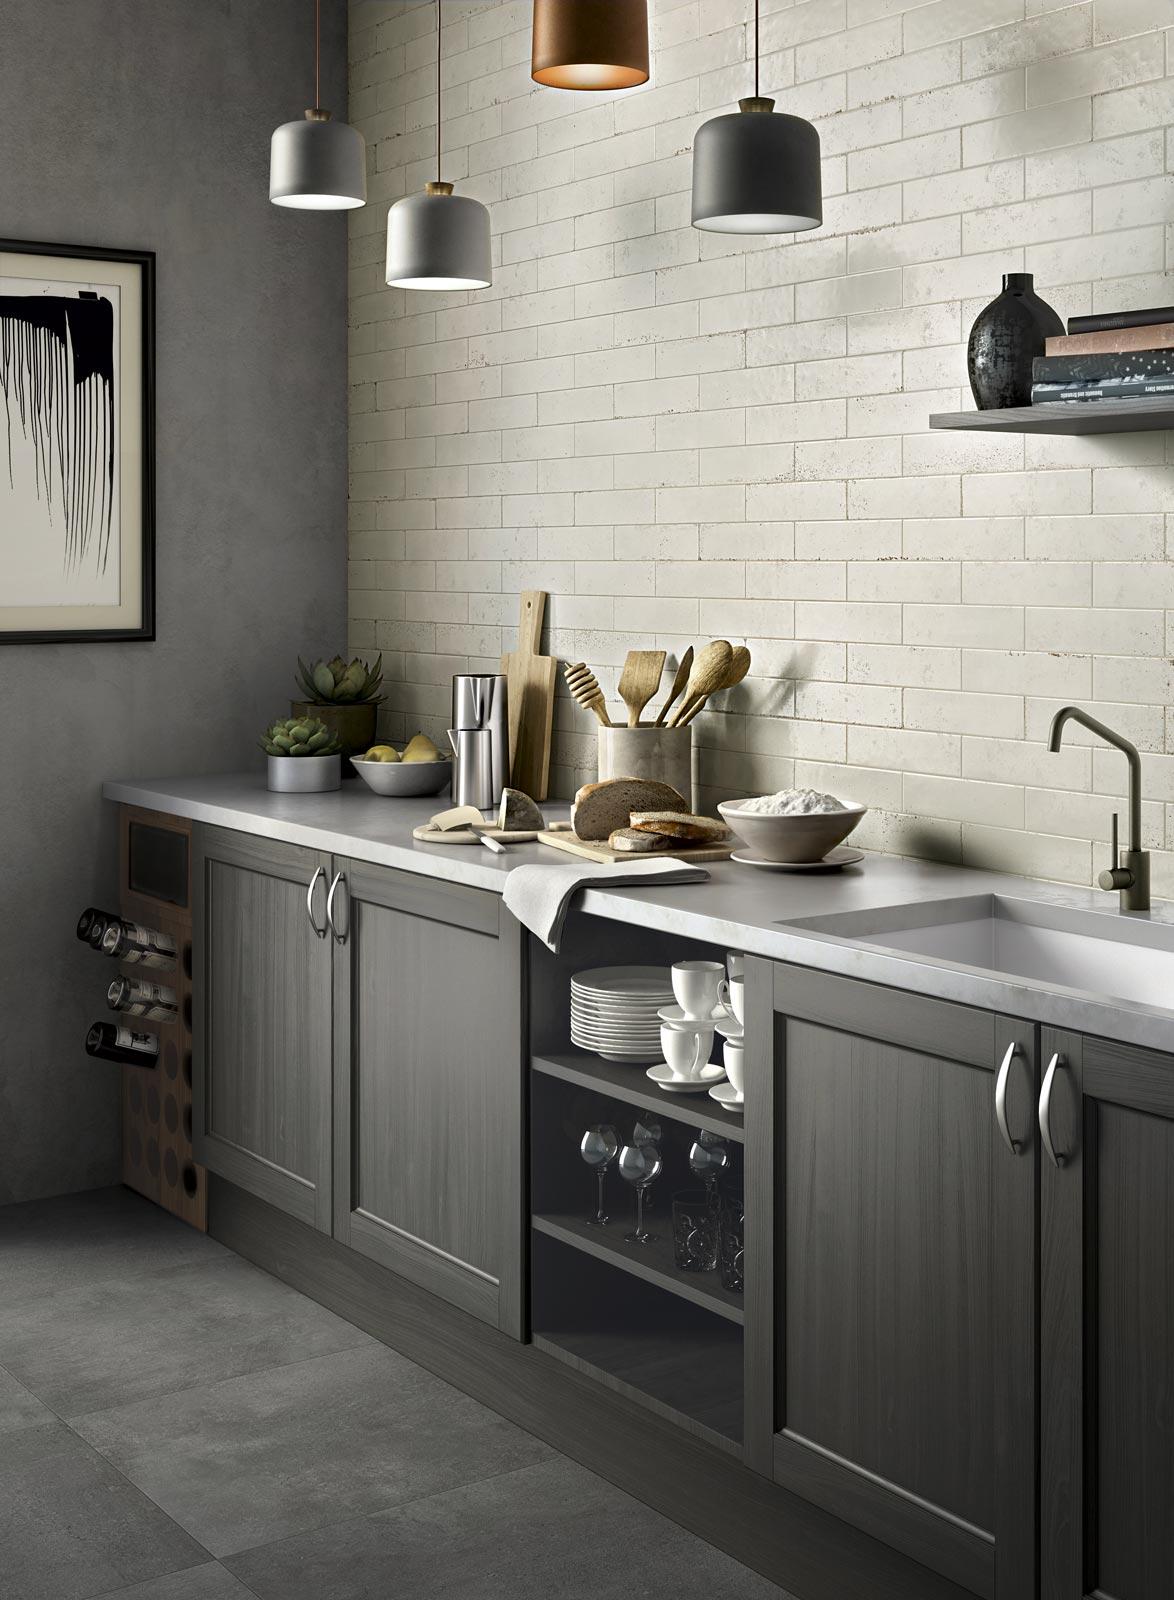 Emejing Piastrelle Cucina Design Pictures - bakeroffroad.us ...